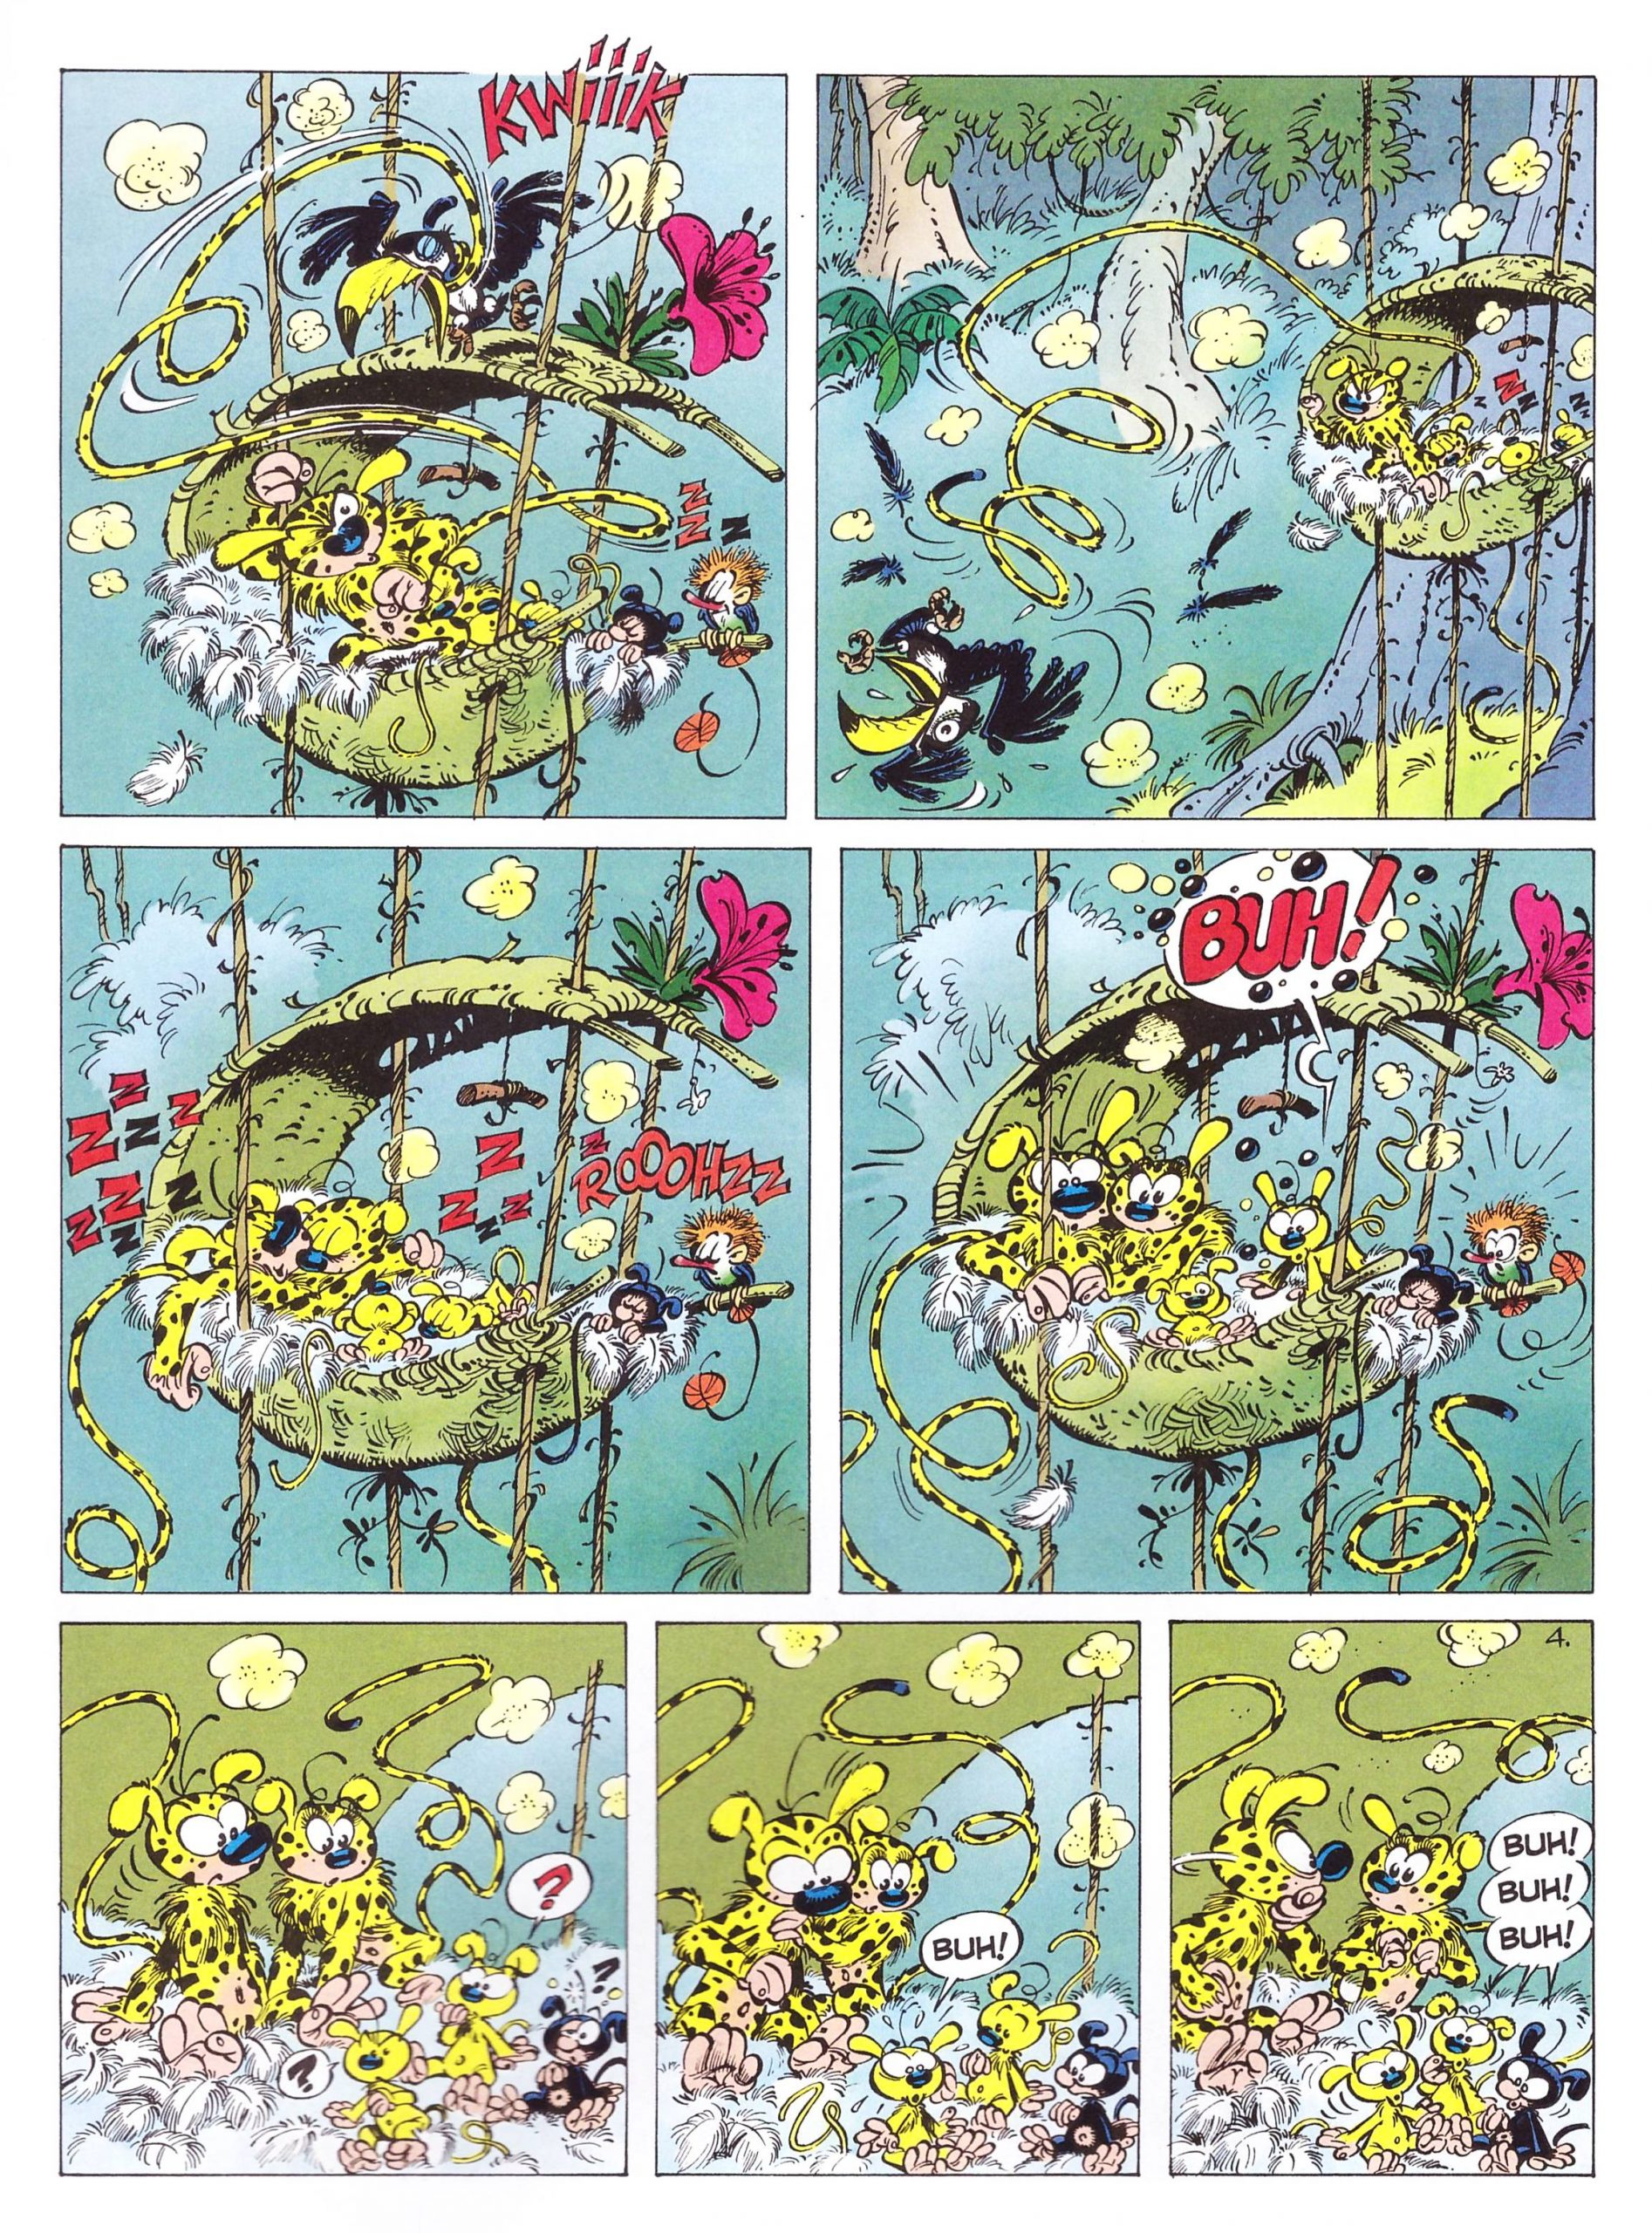 Marsupilami 4 The Pollen of Monte Urticando review